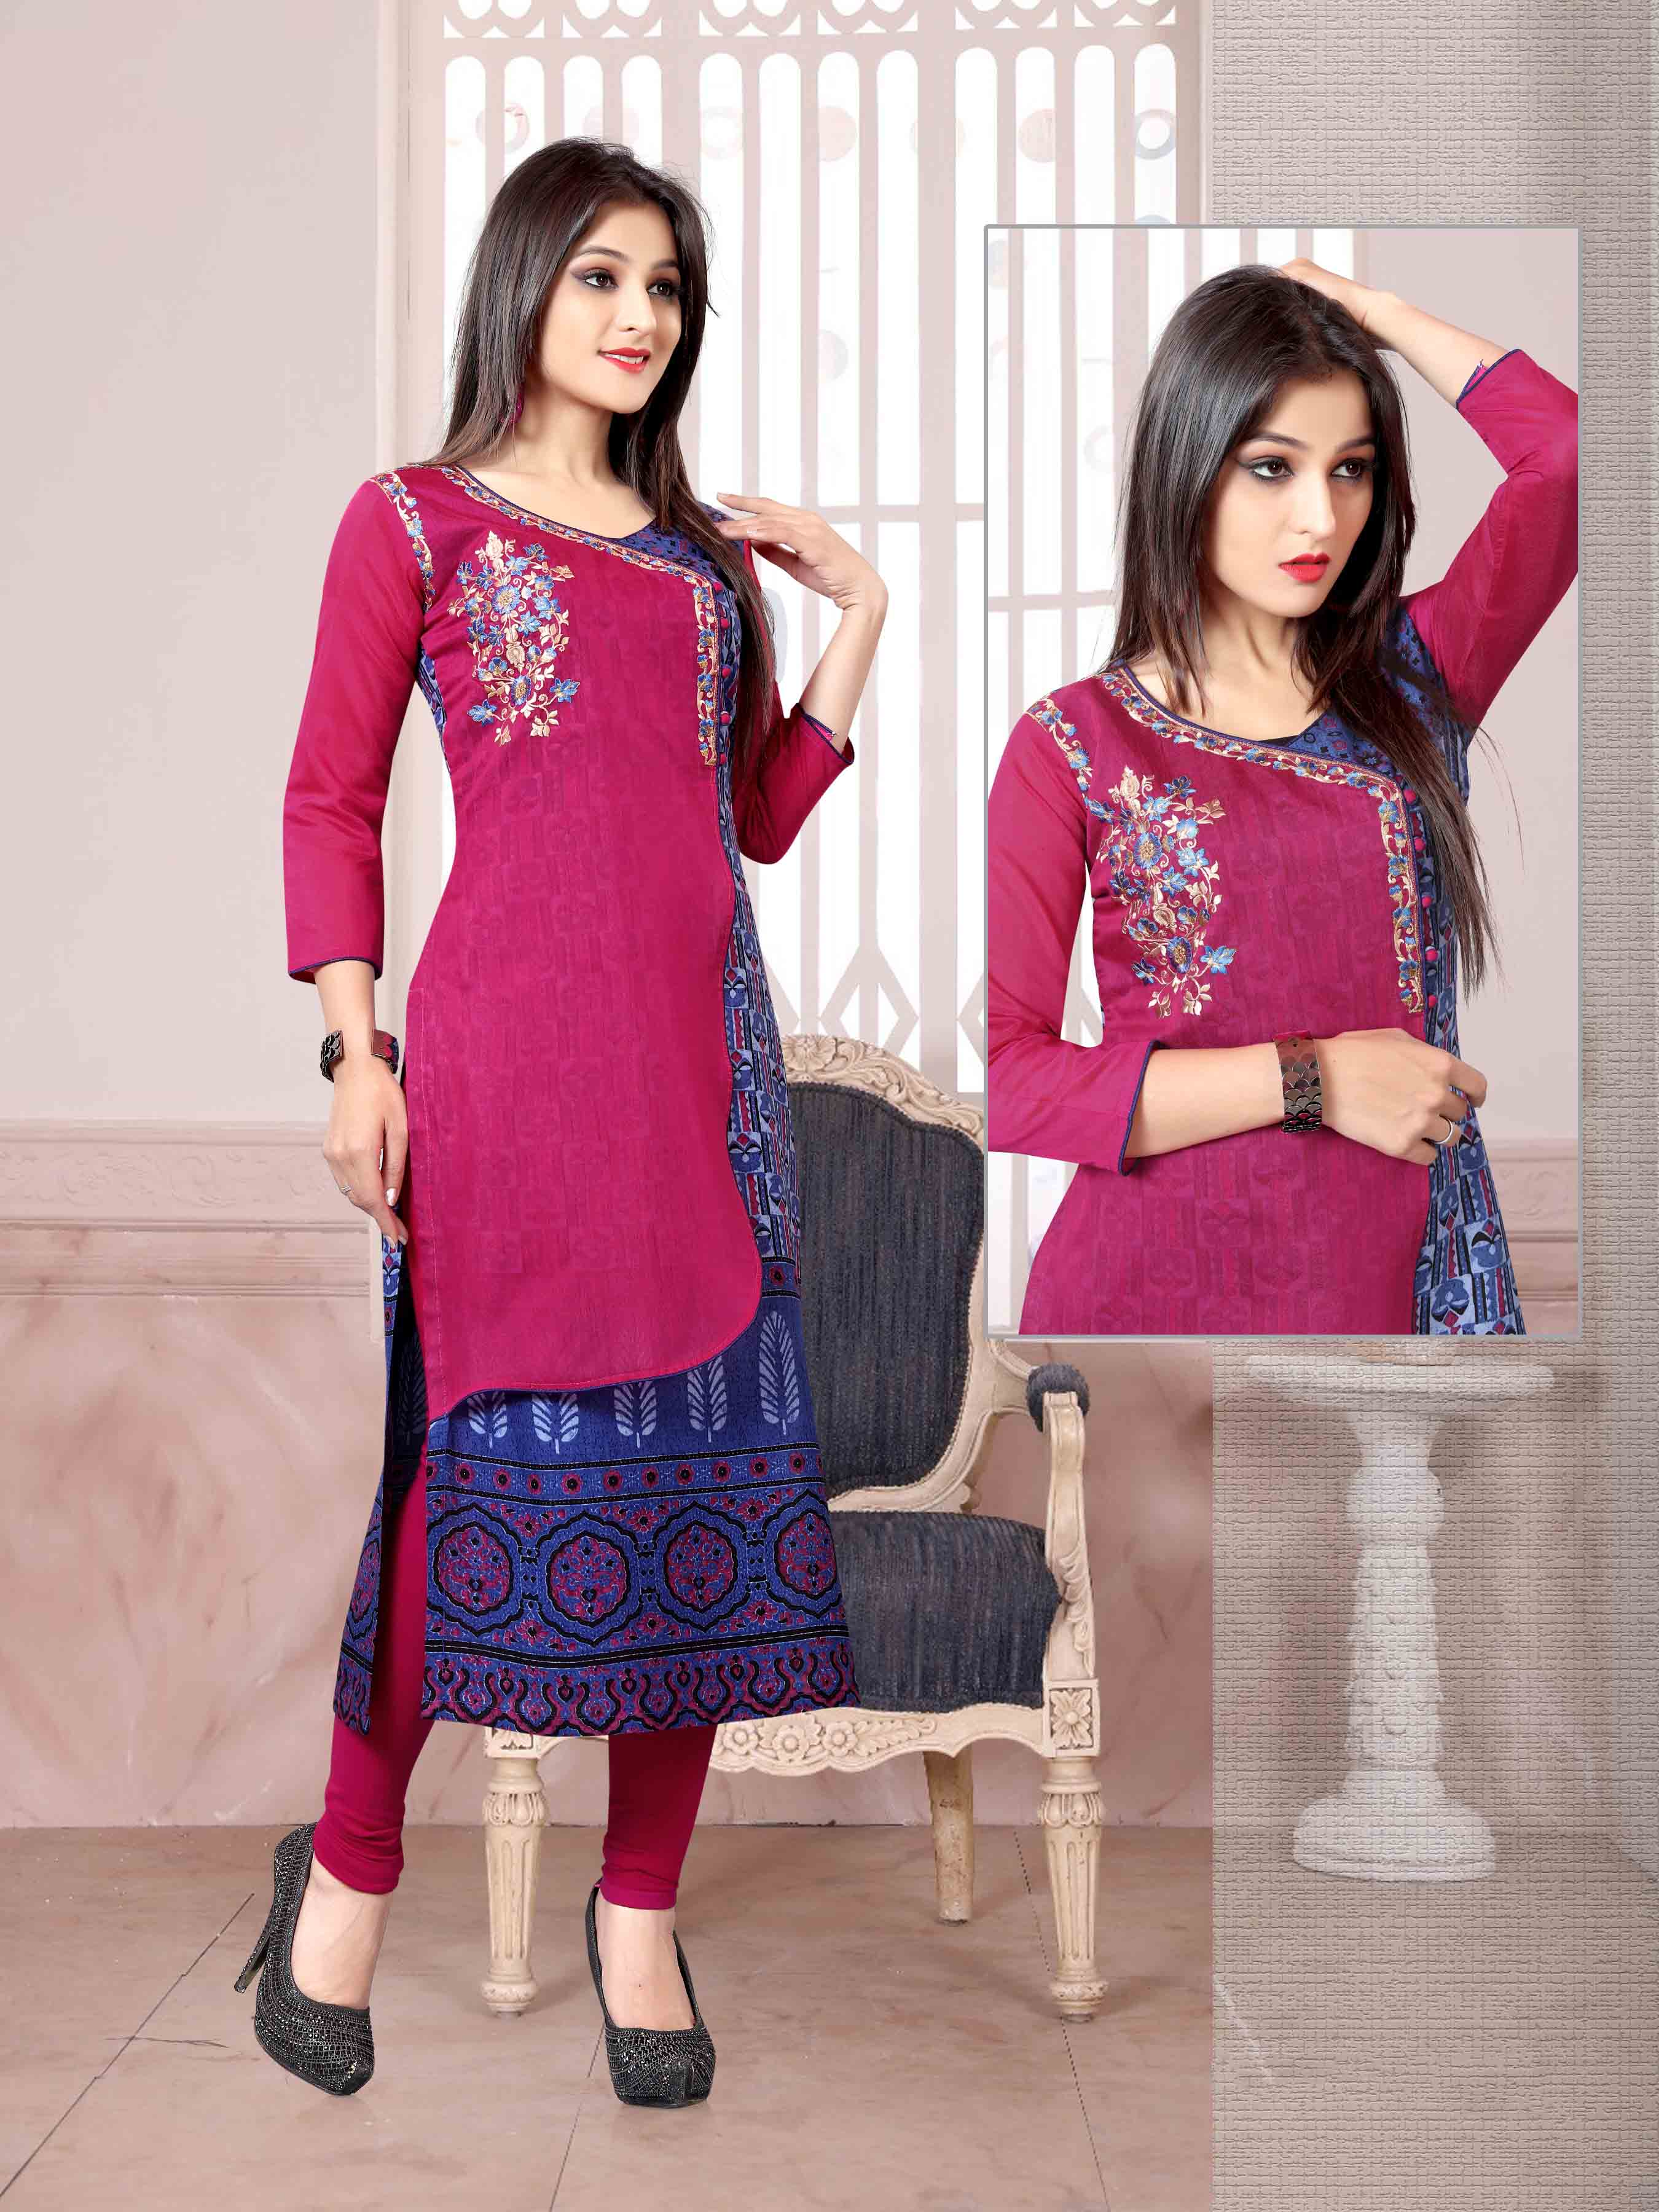 Chanderi Chex & Rayon Kurti Nexa CB066 | Readymade Wear